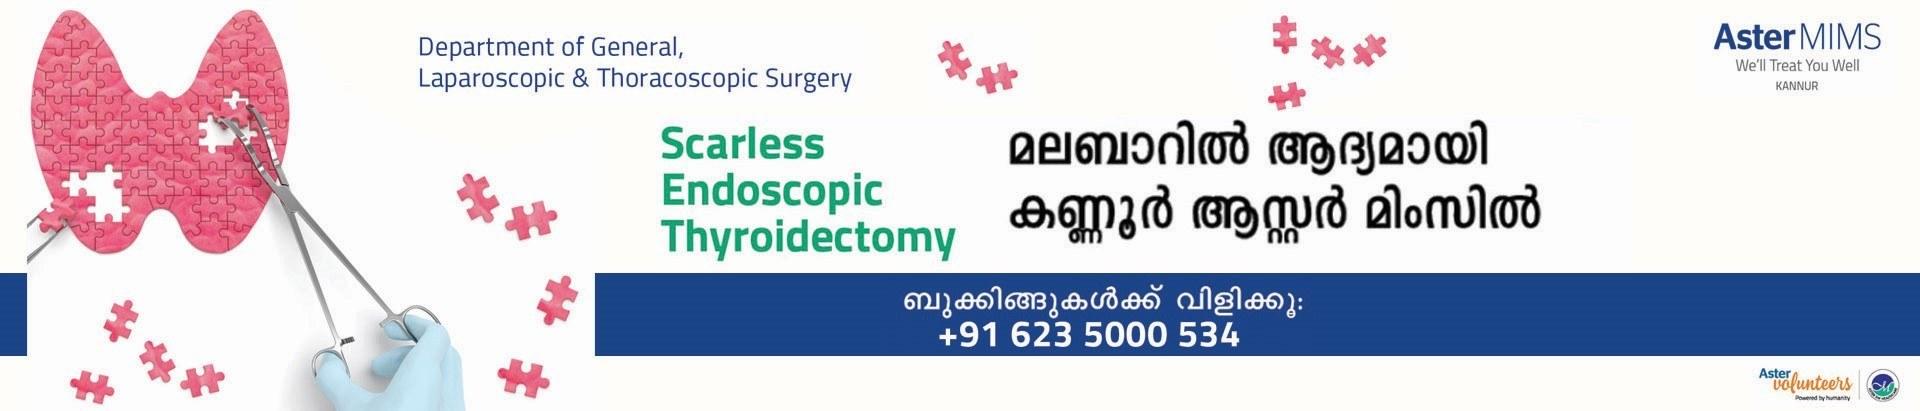 Laproscopy